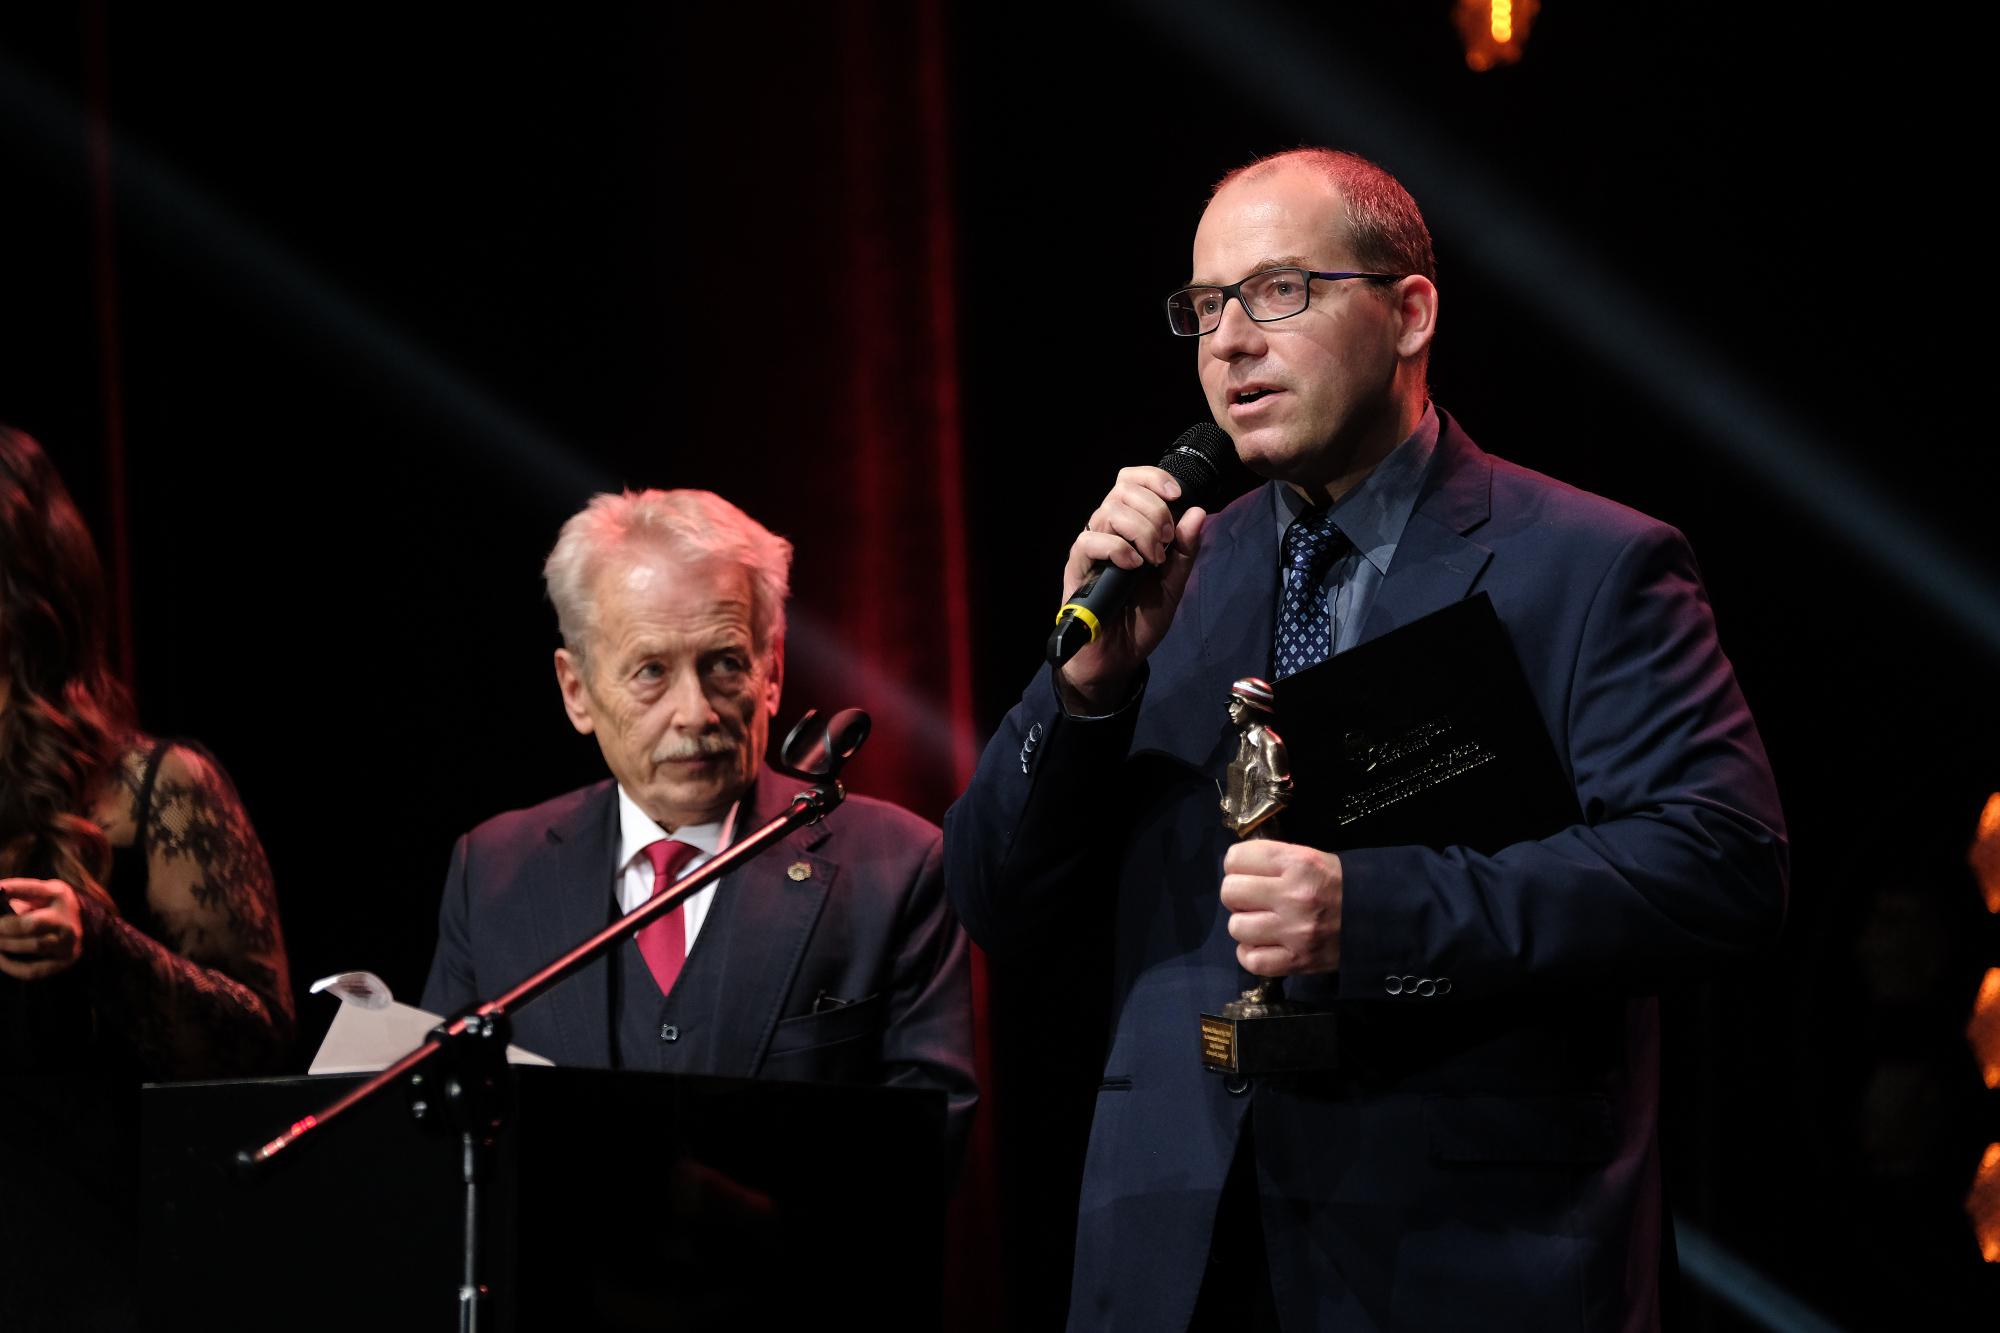 Gala_BohaterONy_2019_fot_Piotr_Litwic (31)